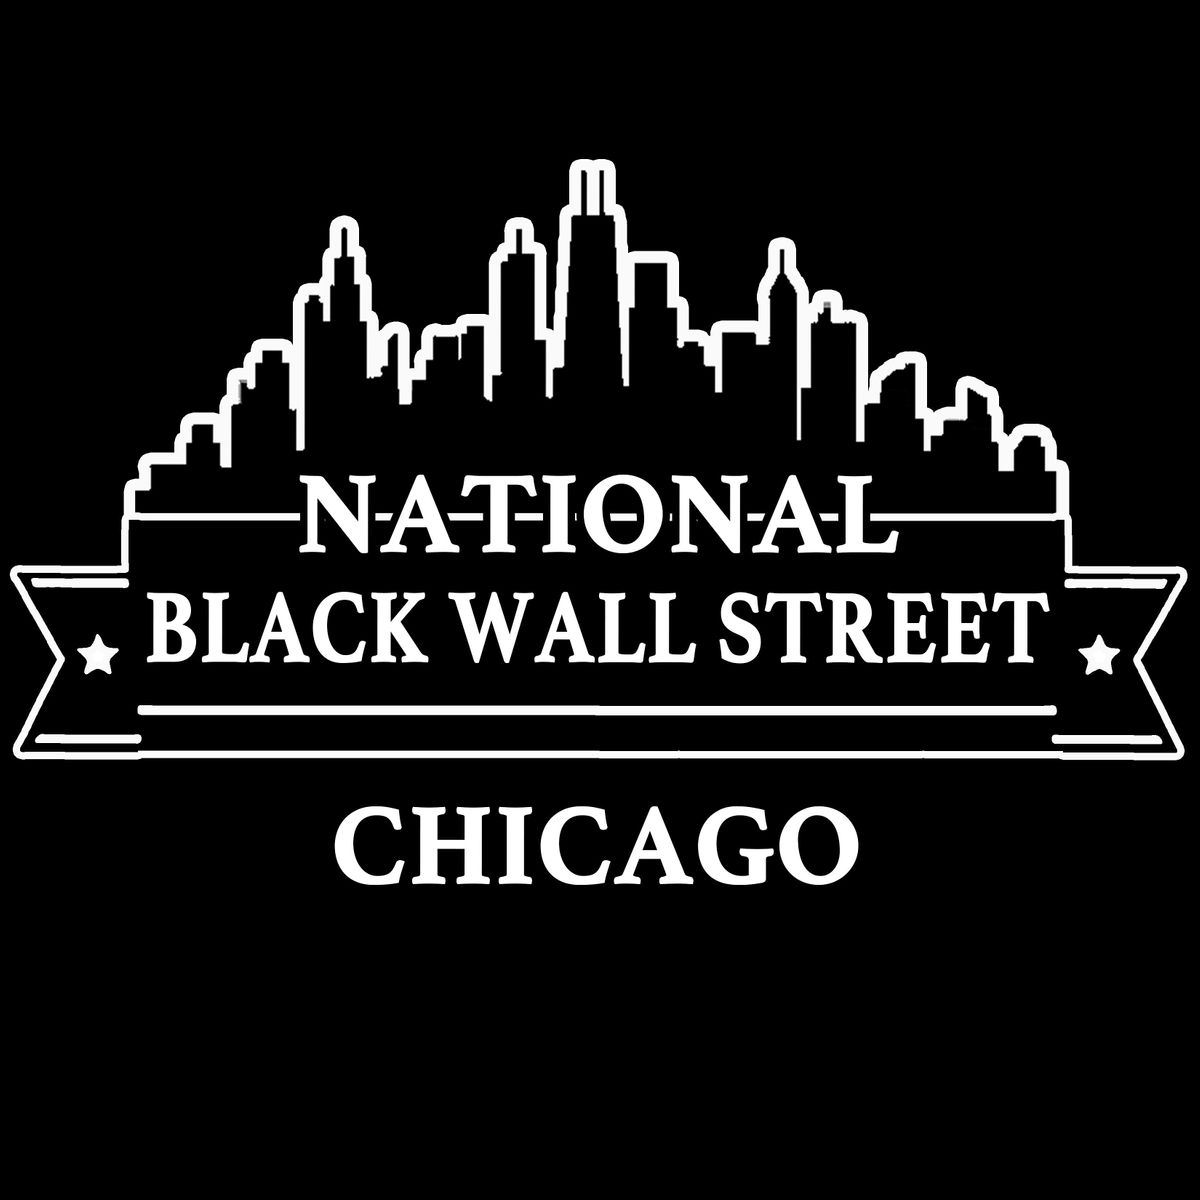 National Black Wall Street Chicago Open House Fundraiser